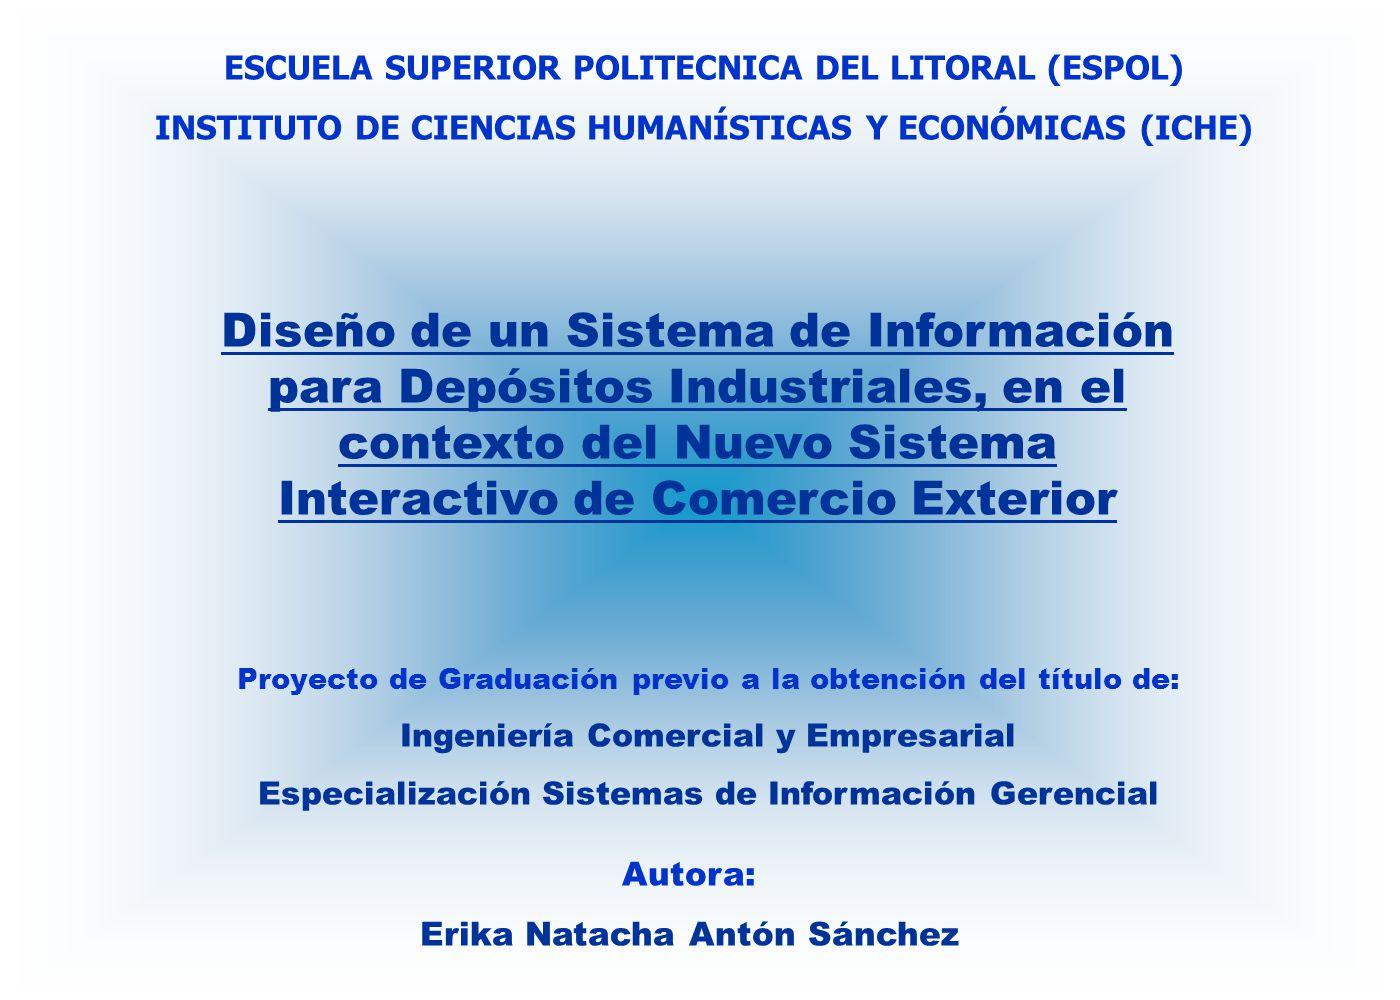 ESCUELA SUPERIOR POLITECNICA DEL LITORAL (ESPOL)